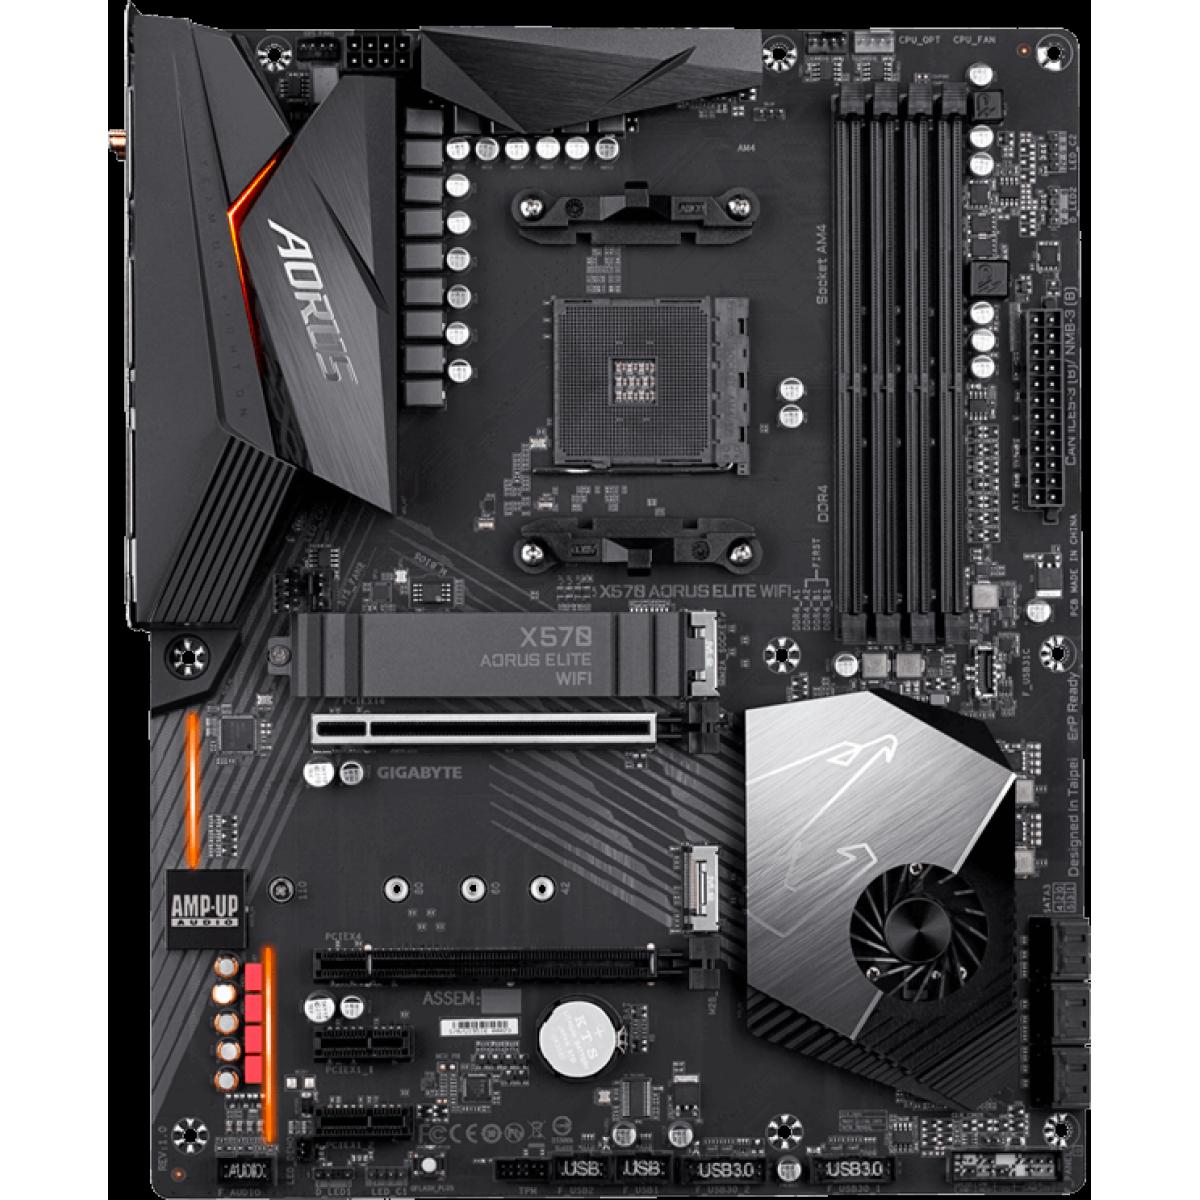 Placa Mãe Gigabyte X570 Aorus Elite WI-FI, Chipset X570, AMD AM4, ATX, DDR4